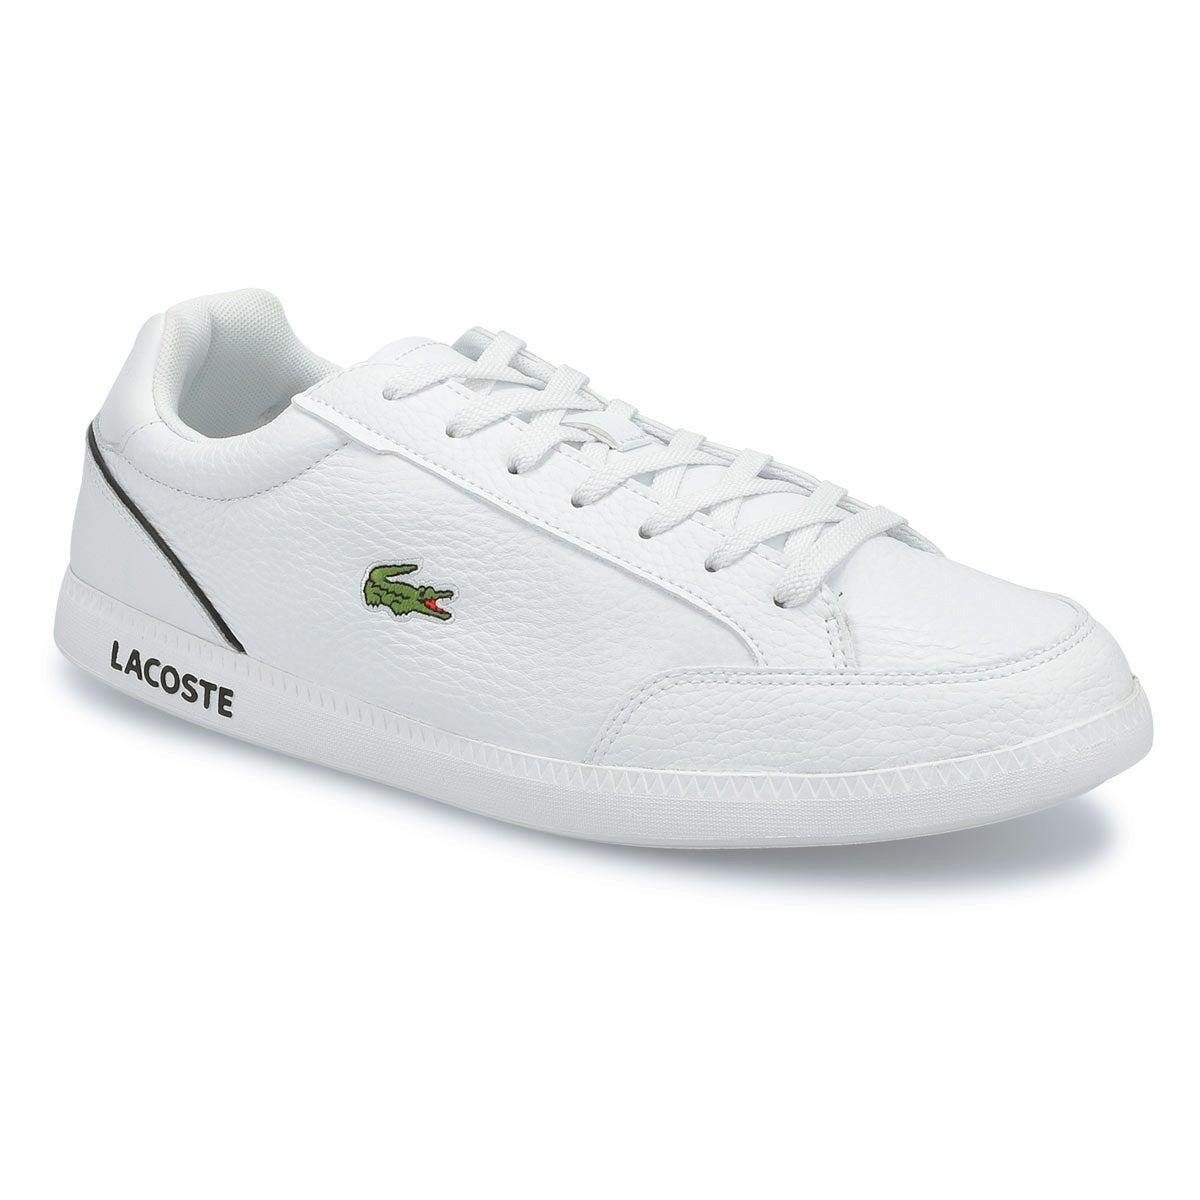 Mns Graduate Cap 0721 1 wht/blk sneaker